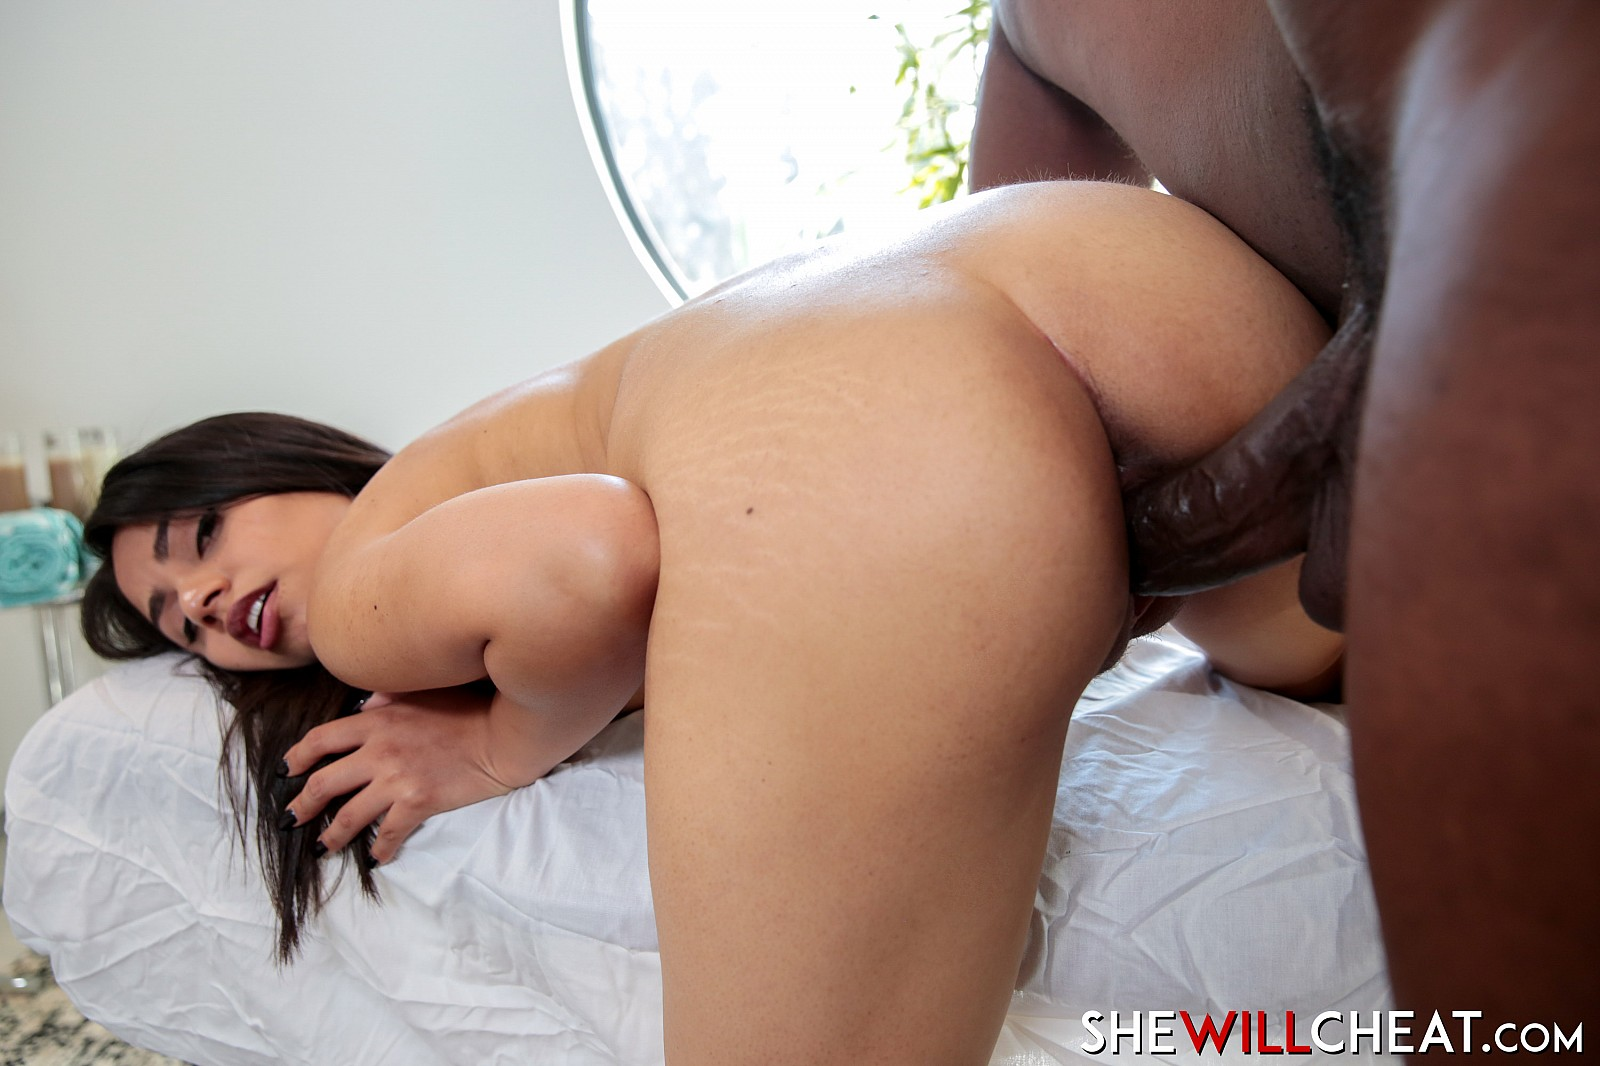 Unfaithful Wife Porn Videos